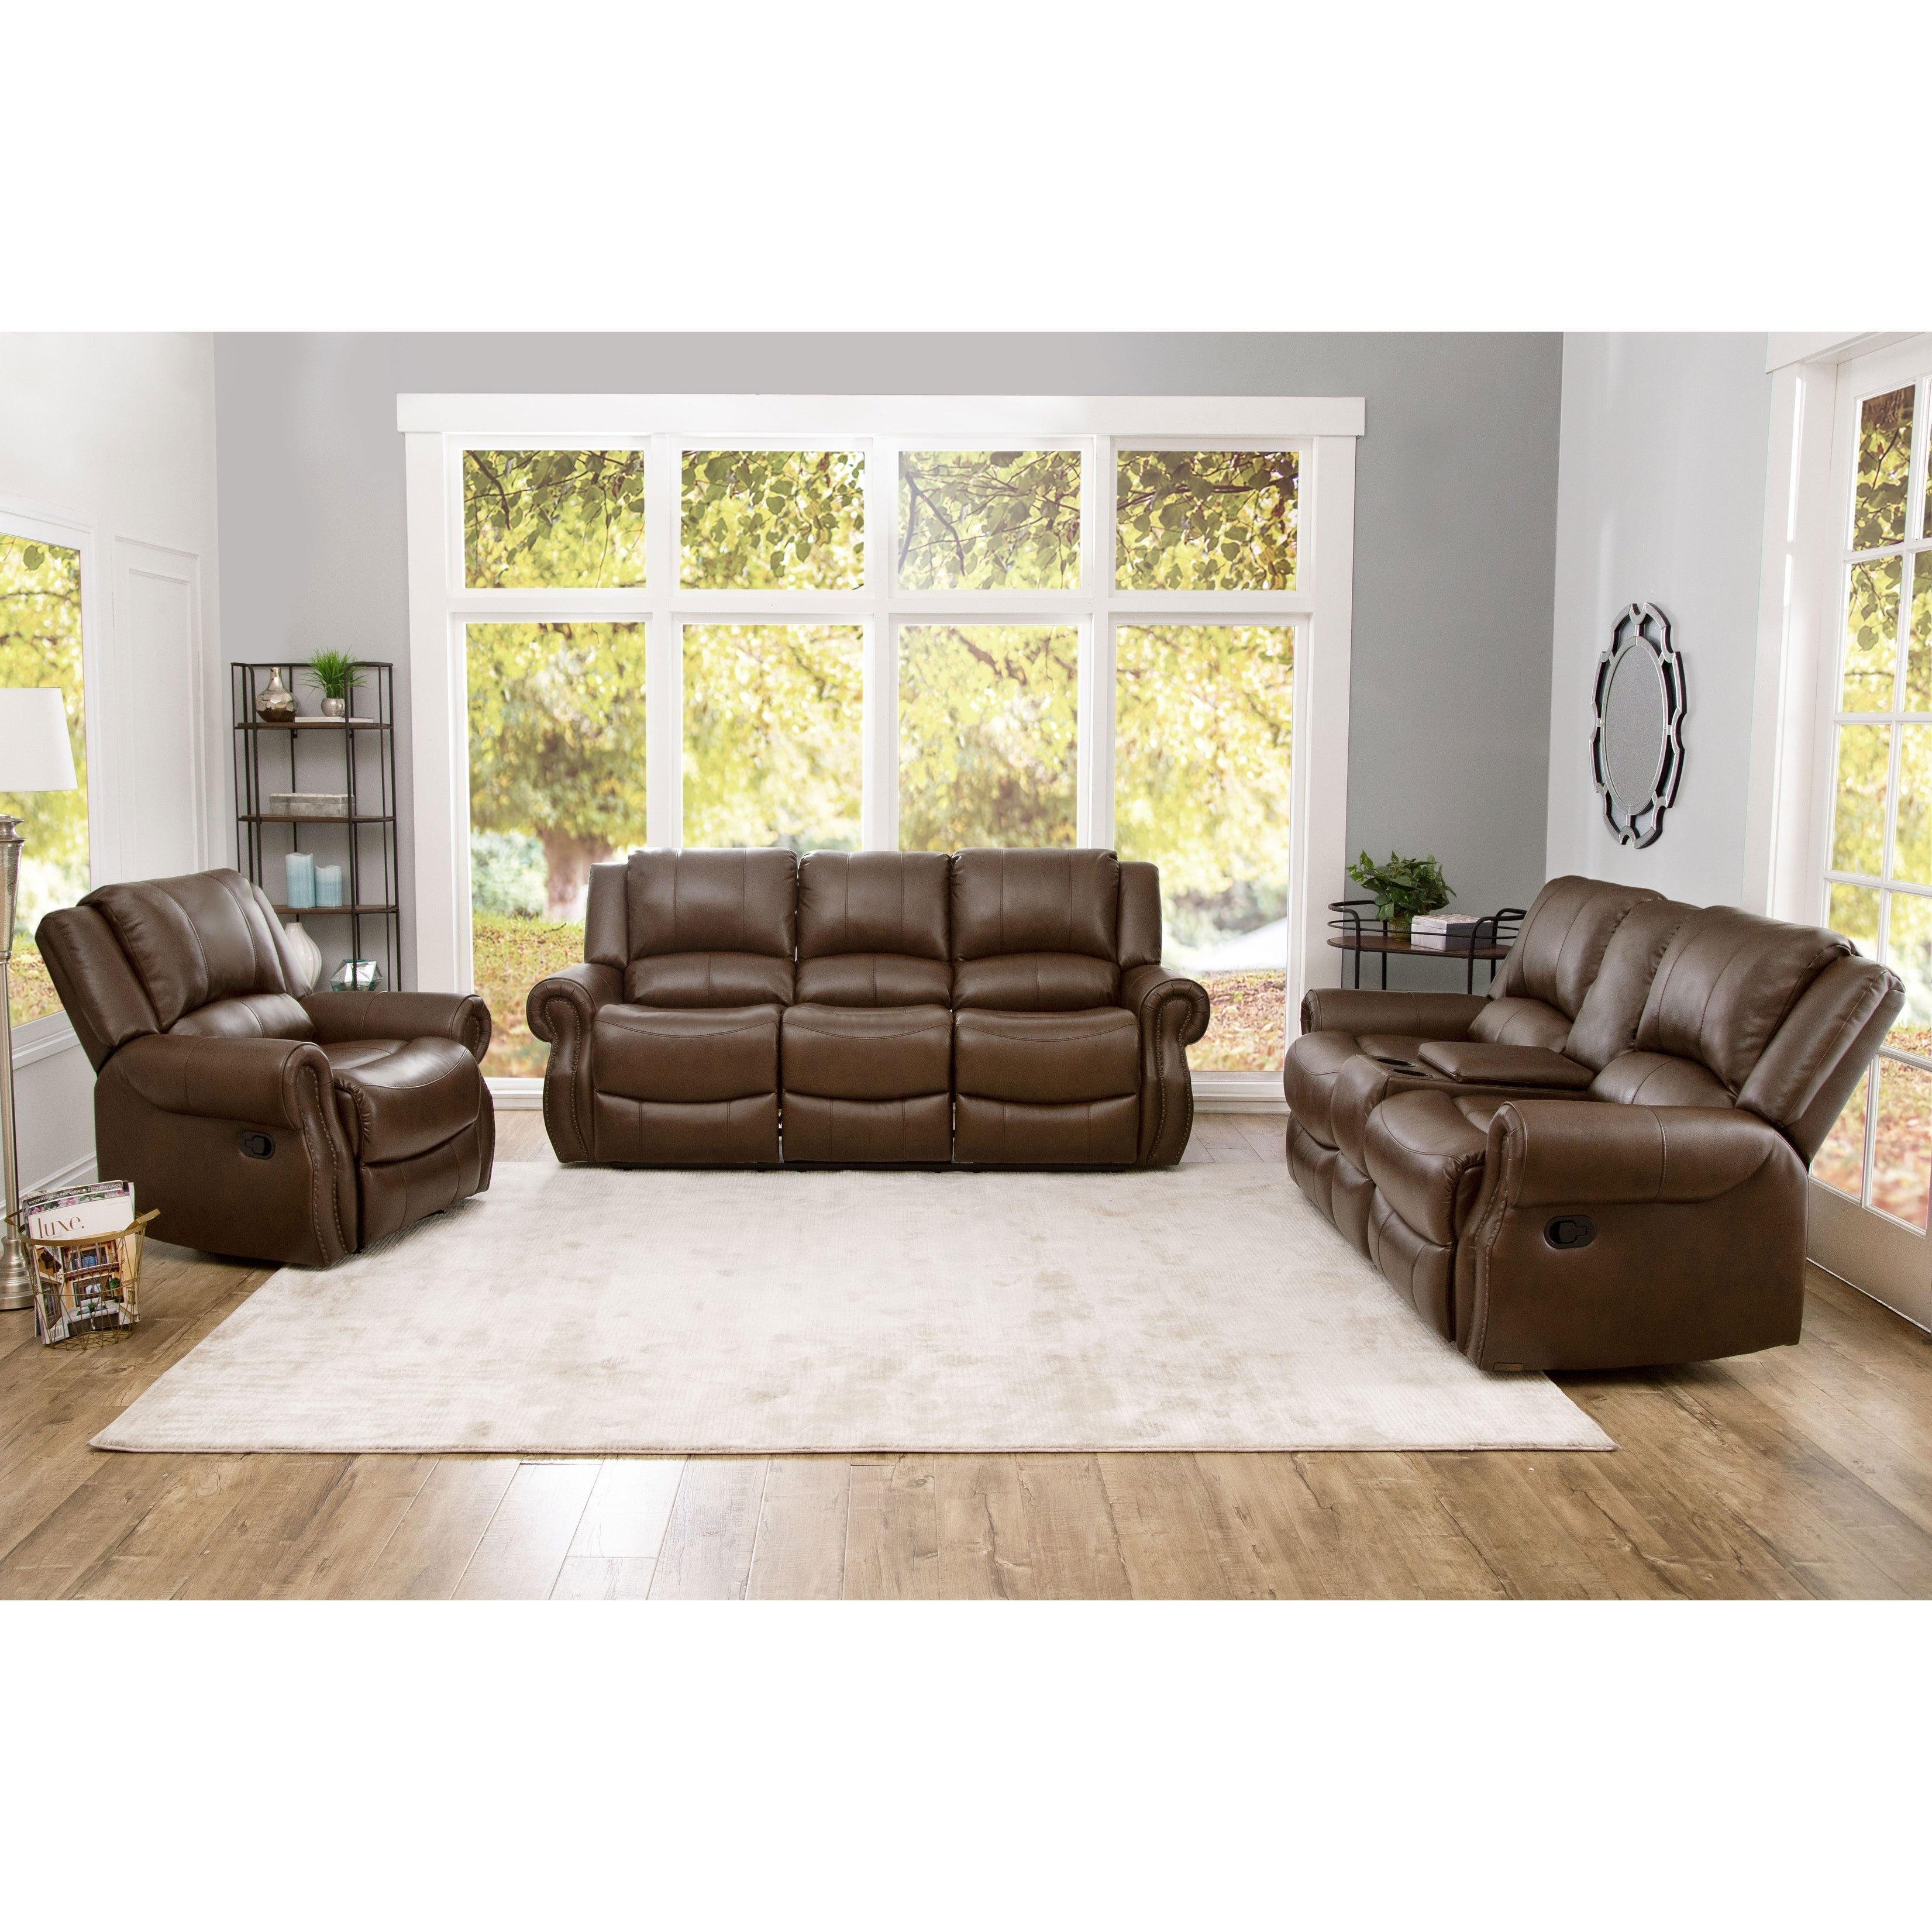 Shop Abbyson Calabasas Mesa Brown Leather 3 Piece Reclining Living ...